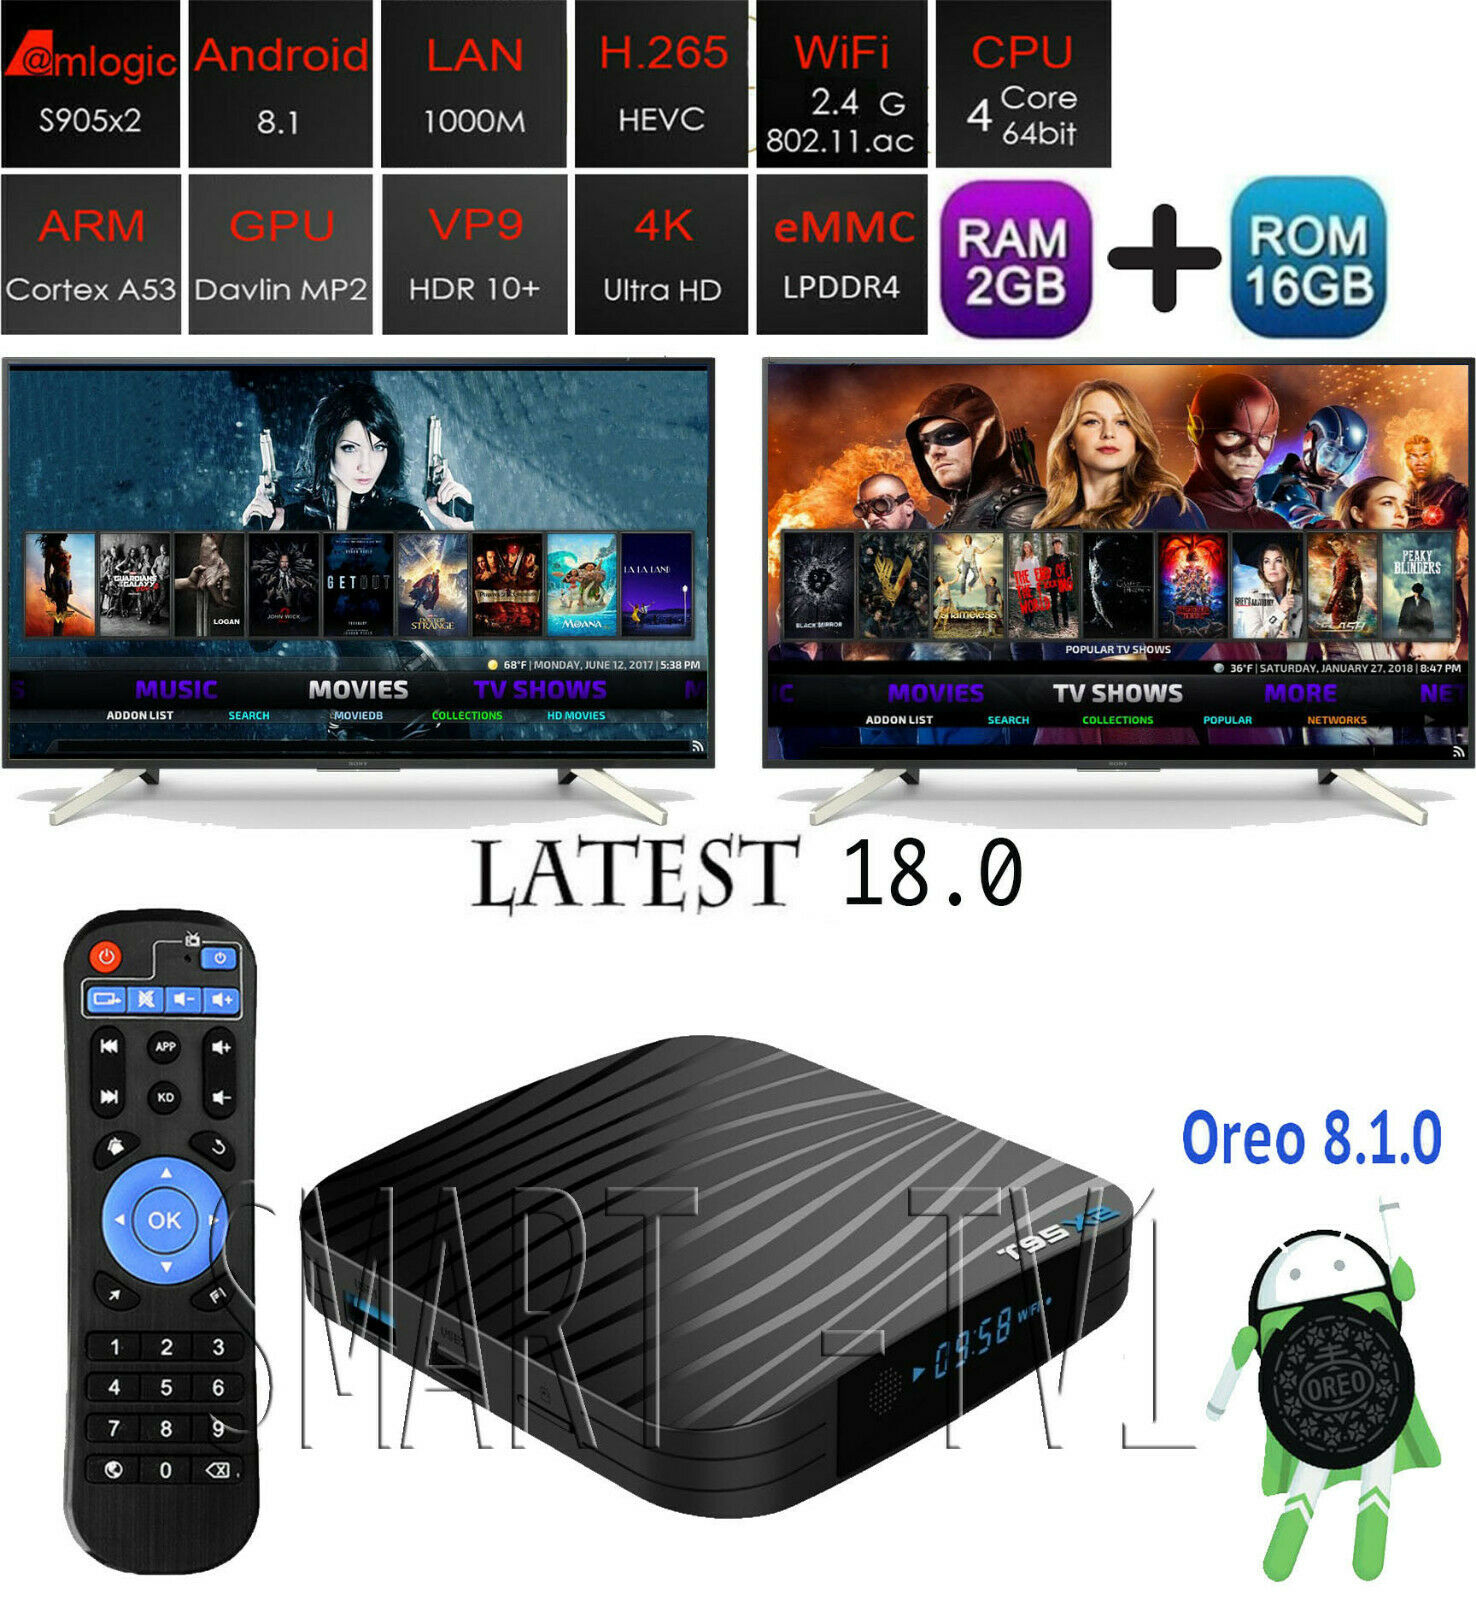 T95X2 4K Android 8.1.0 Oreo WiFi Smart TV Box w  KD 18.0 - 2G+16G   S905X2, T95z